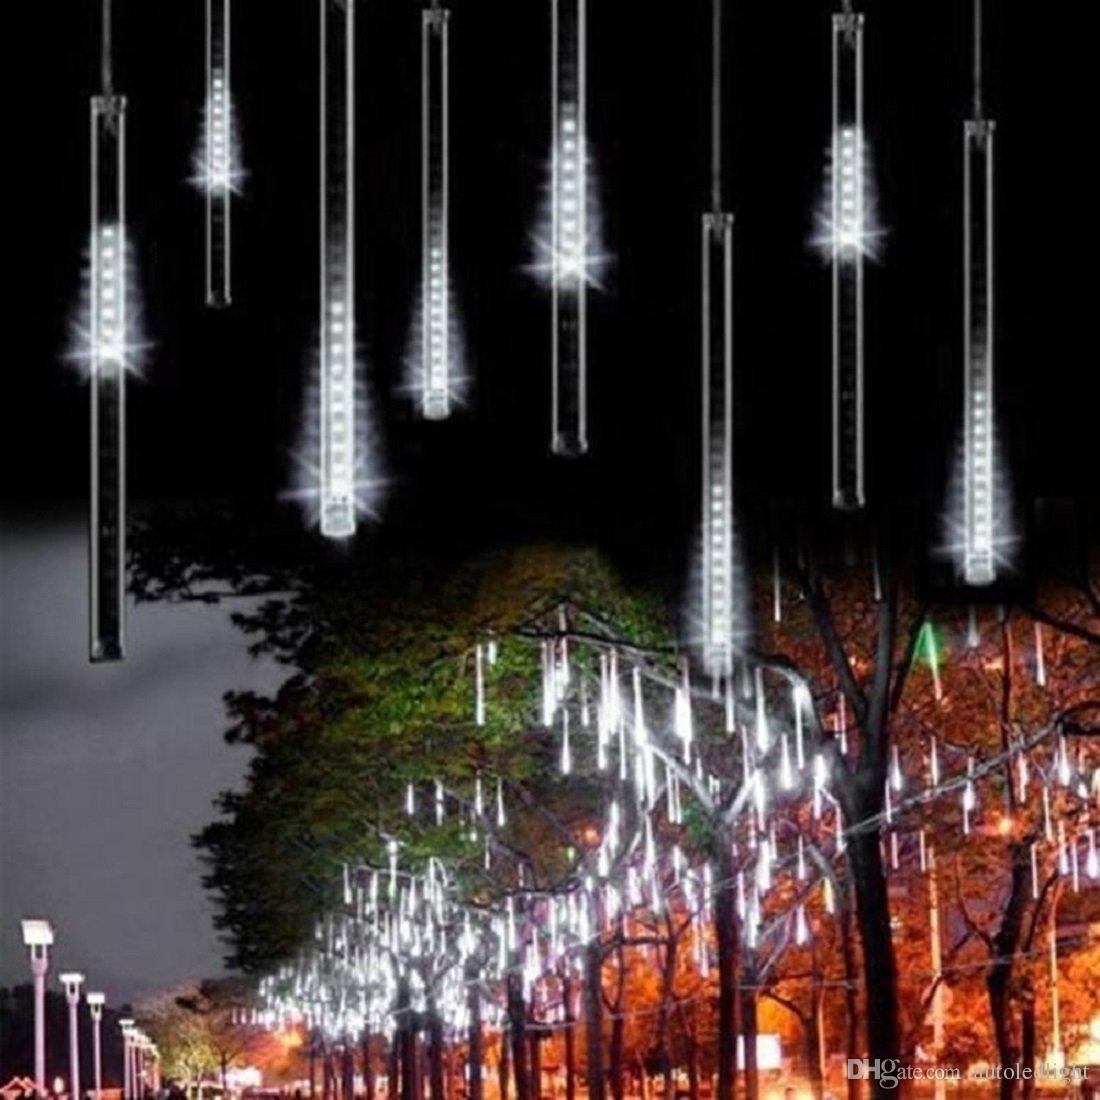 LED 스트링 화이트 유성 샤워 비 조명, 힌크 눈이 떨어지는 빗방울 30cm 8 튜브 웨딩 크리스마스 홈 장식을위한 방수 캐스케이션 조명